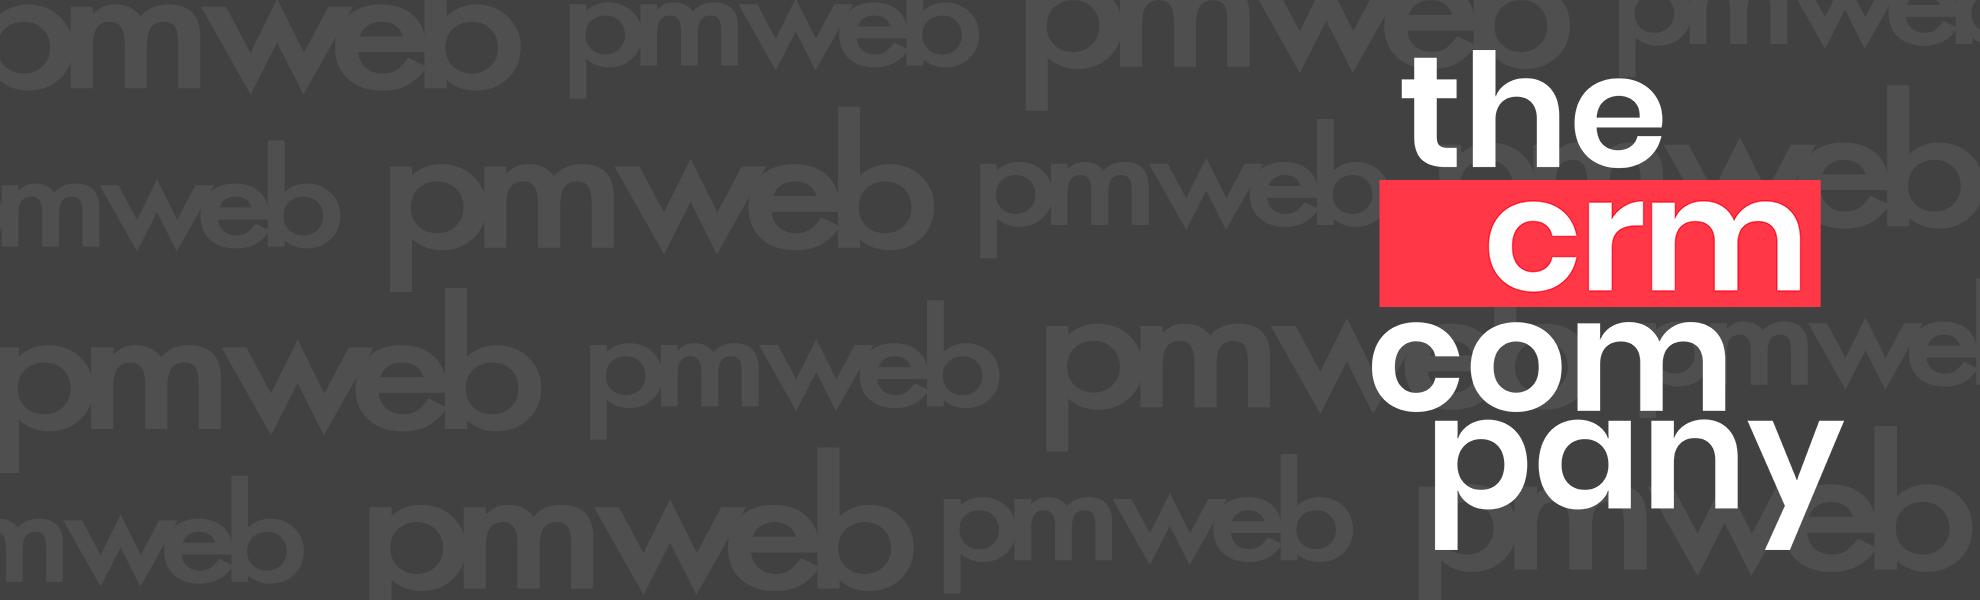 Pmweb